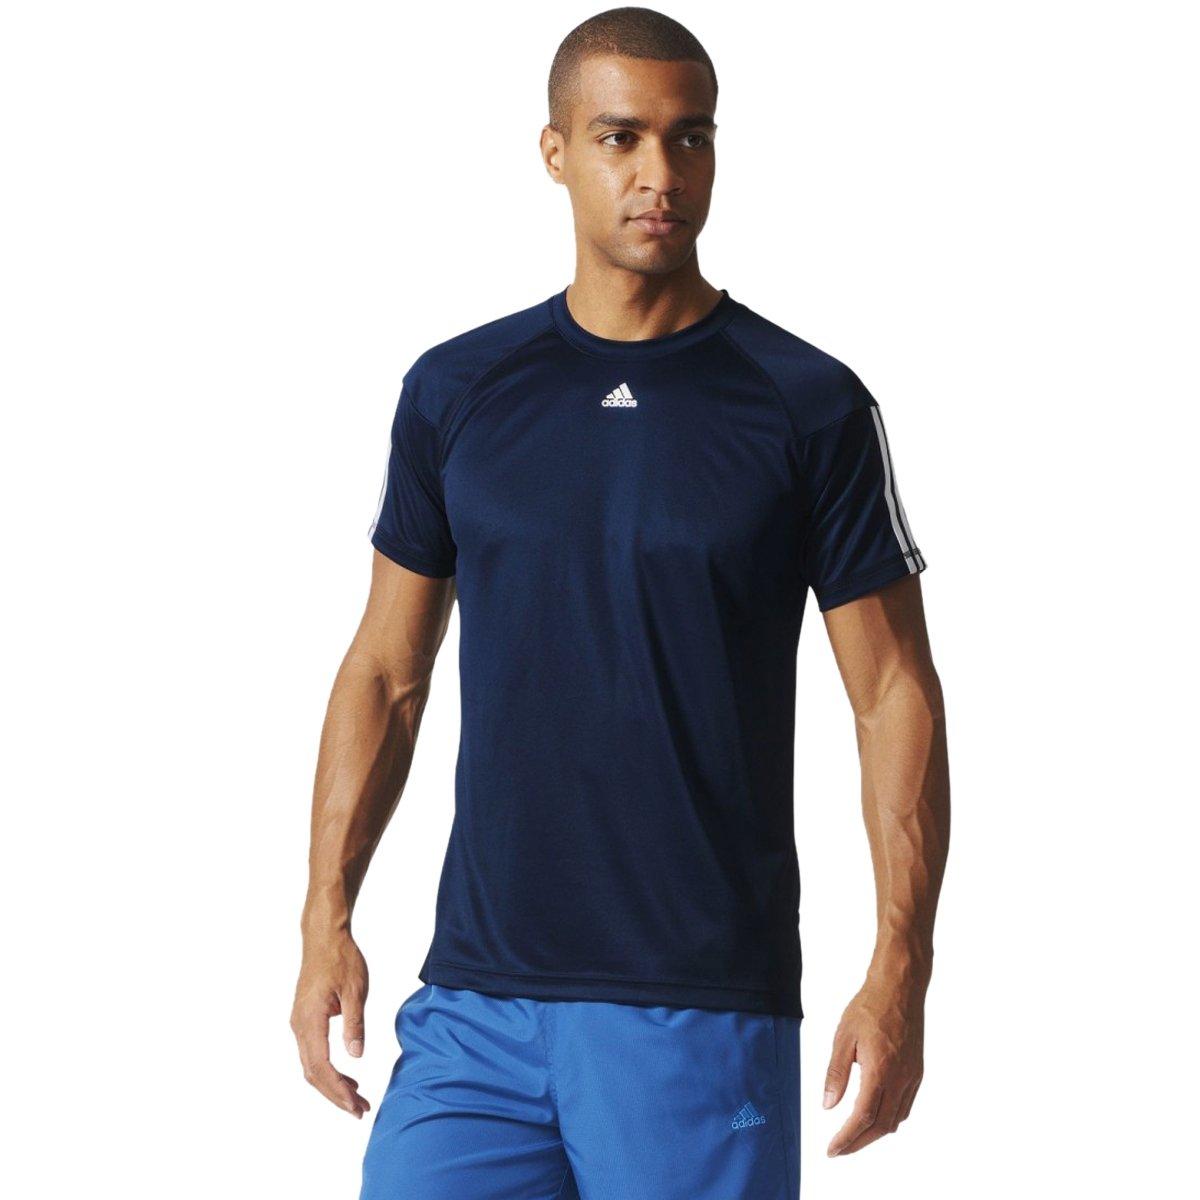 Bizz Store - Camiseta Masculina Adidas Base 3S Azul Manga Curta 4262ad3722a06